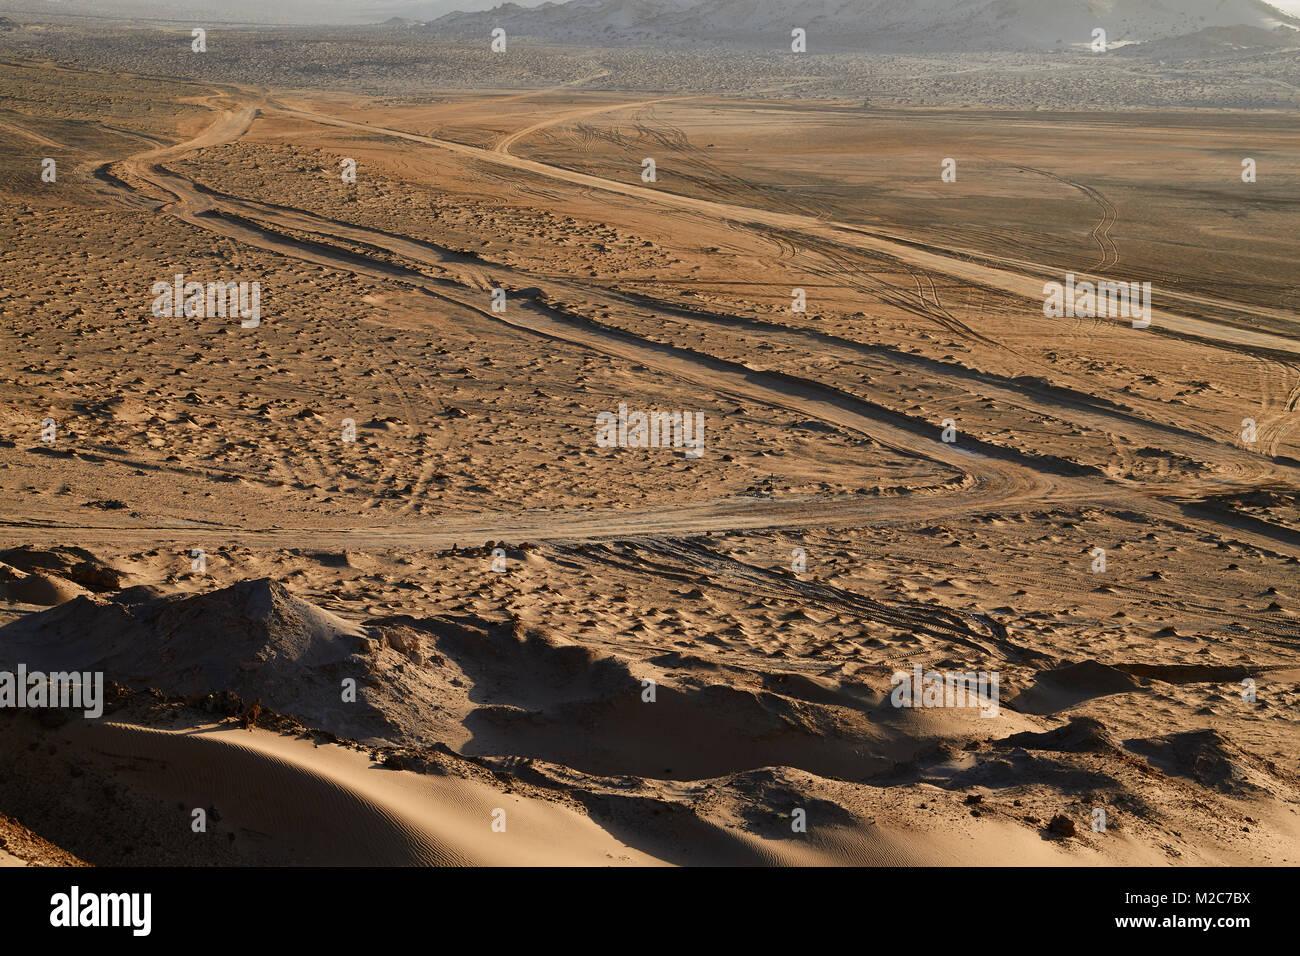 tracks in the desert sand, Western Sahara Stock Photo